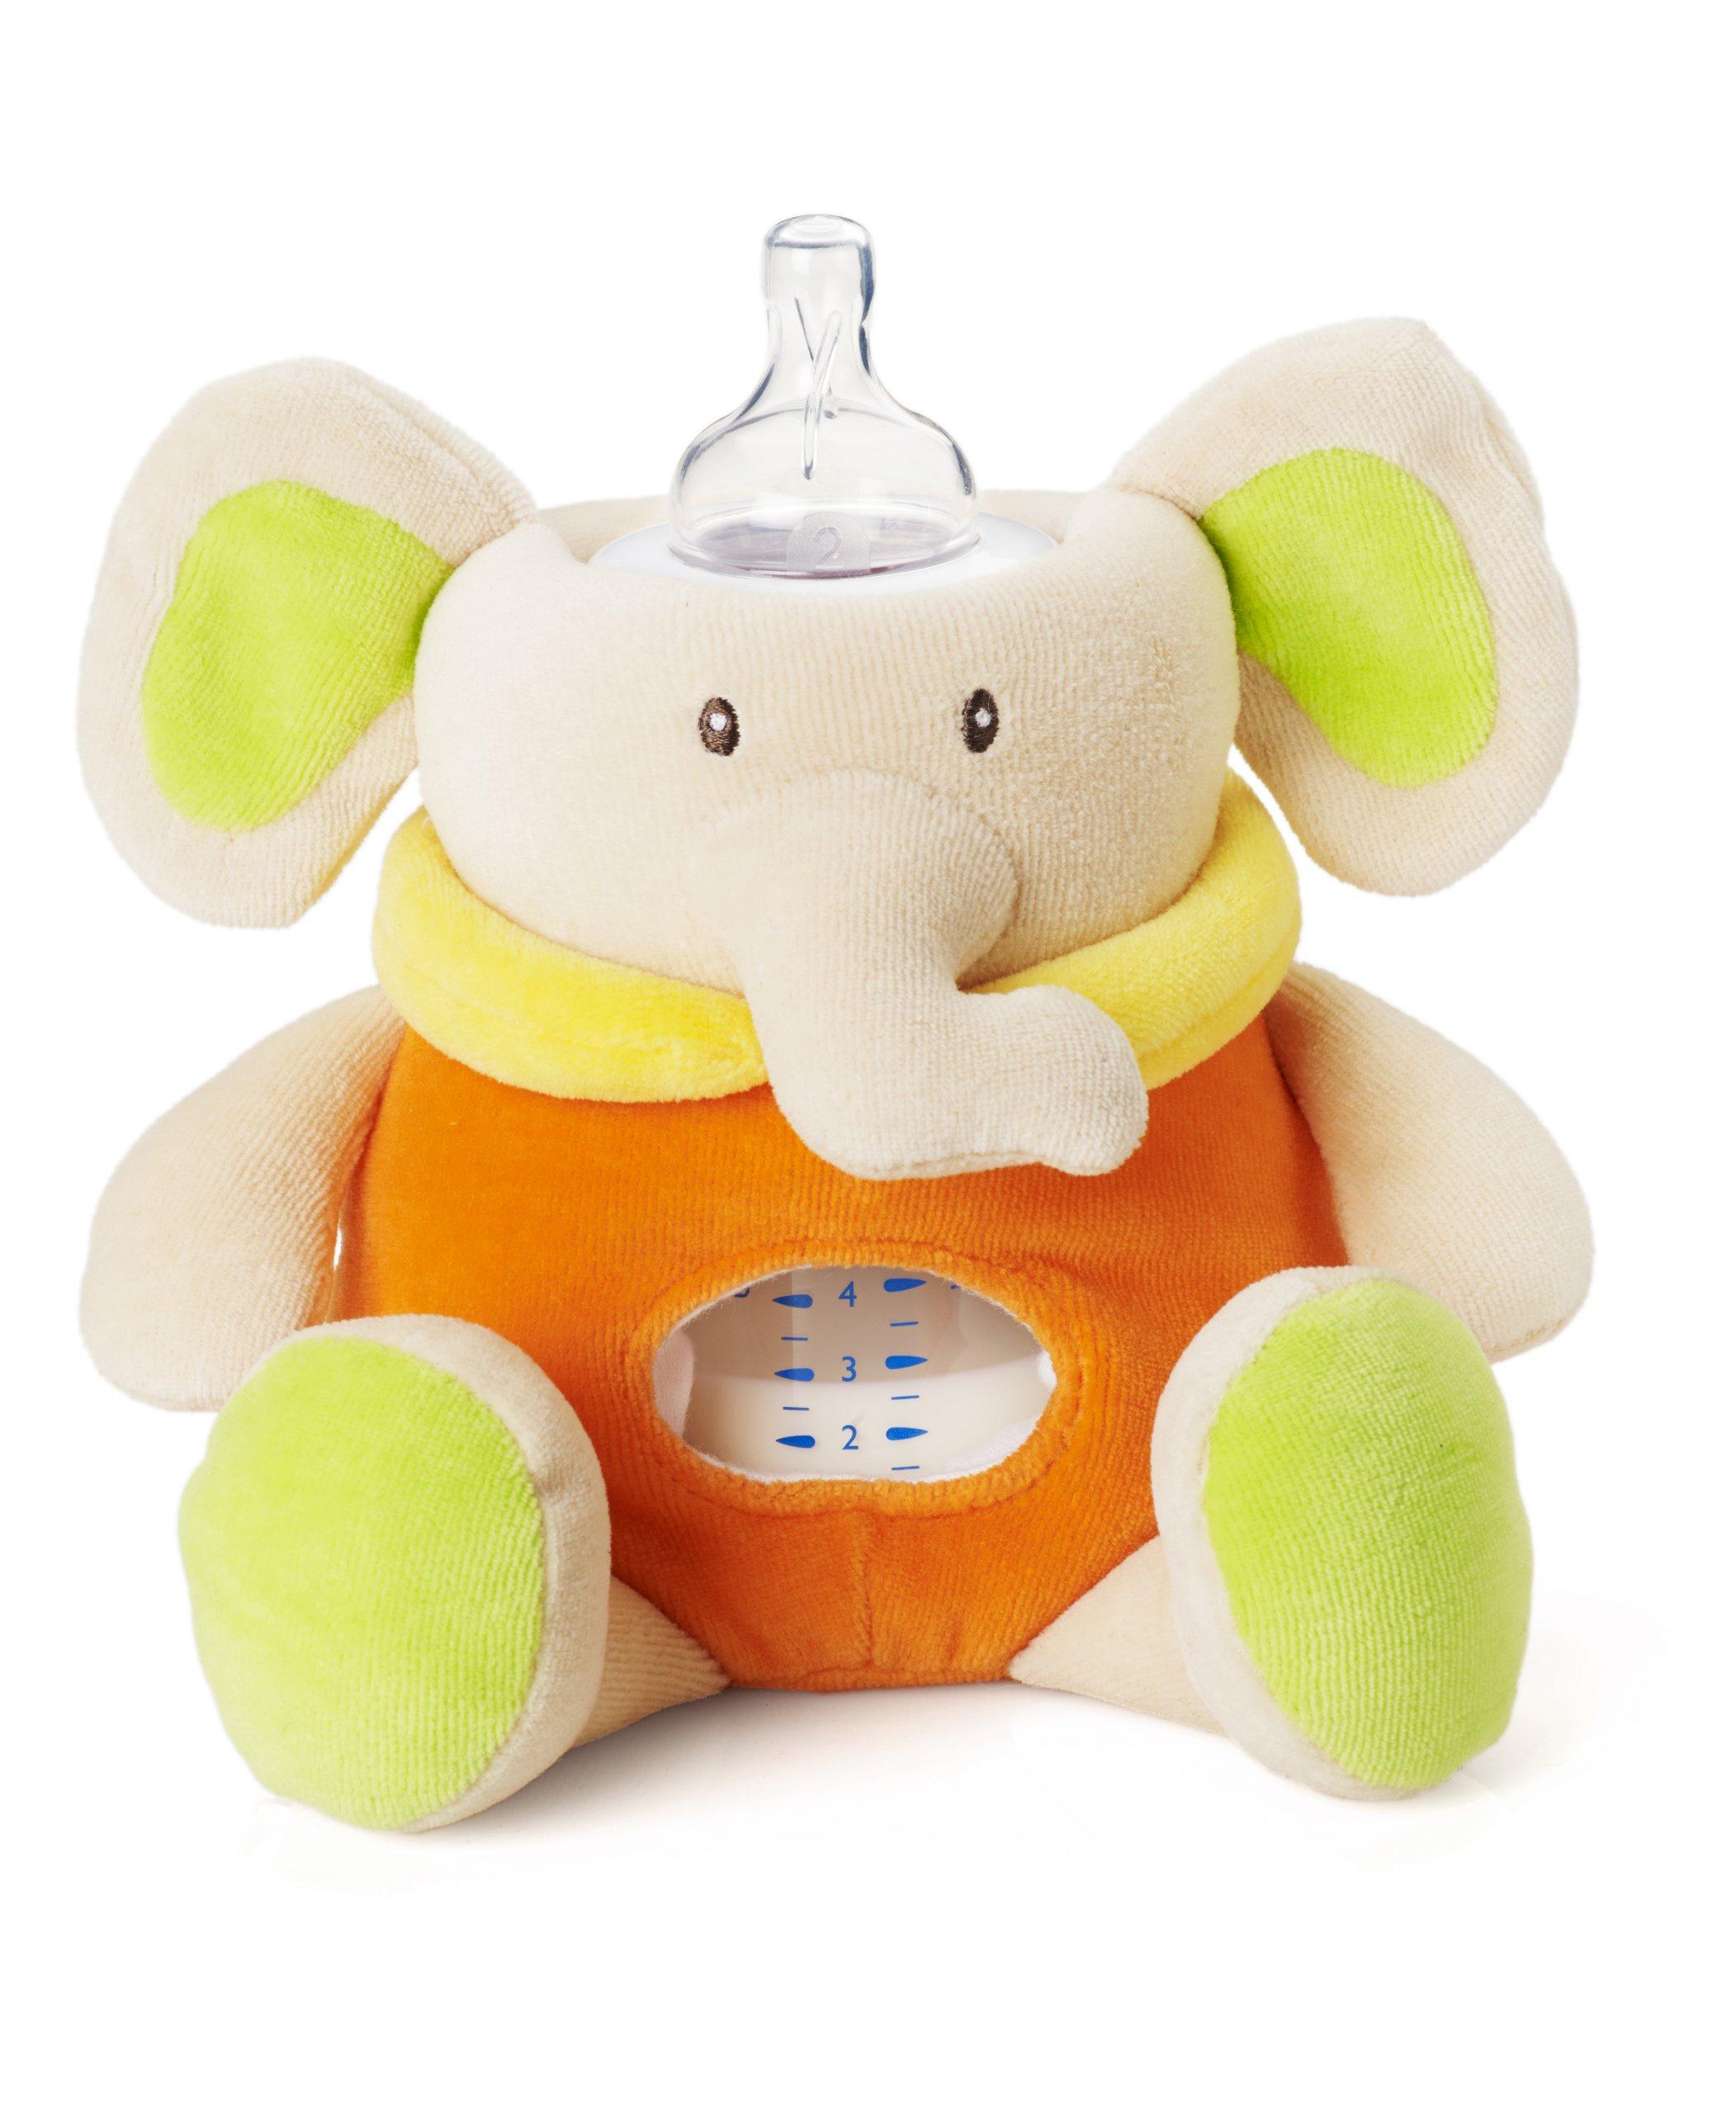 Milkysnugz Elephant Bottle Holder (Orange)